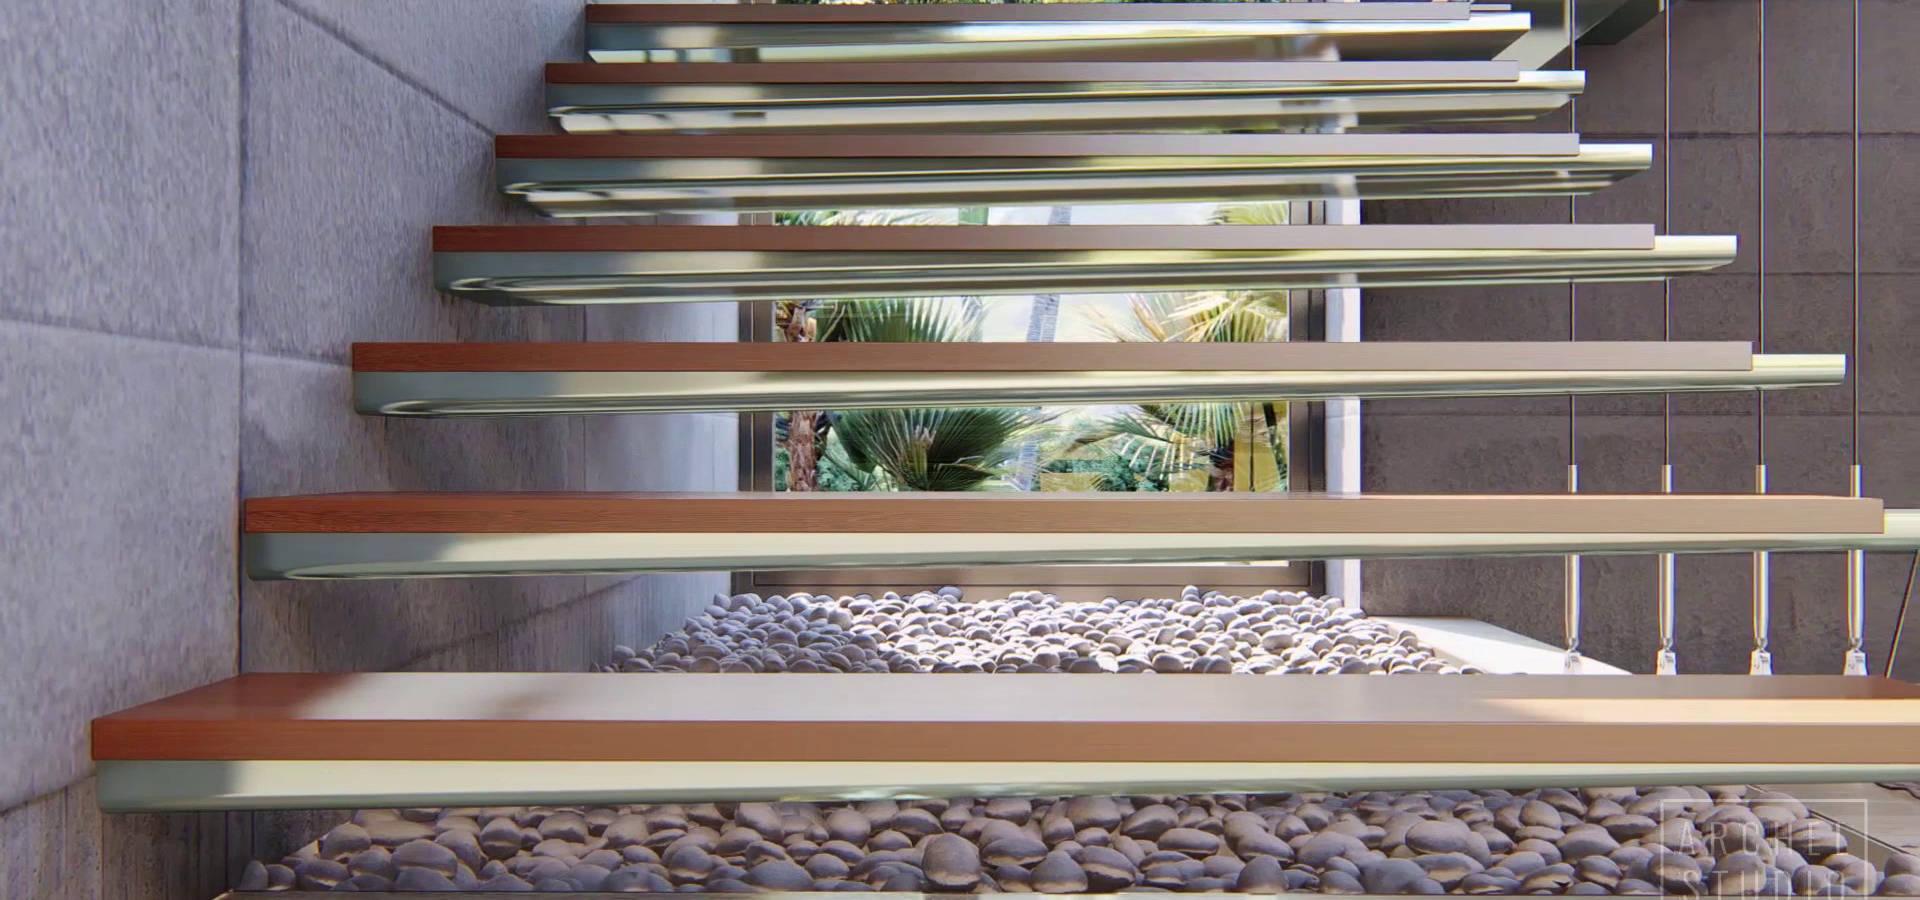 ArchEl Studio: architects & designers